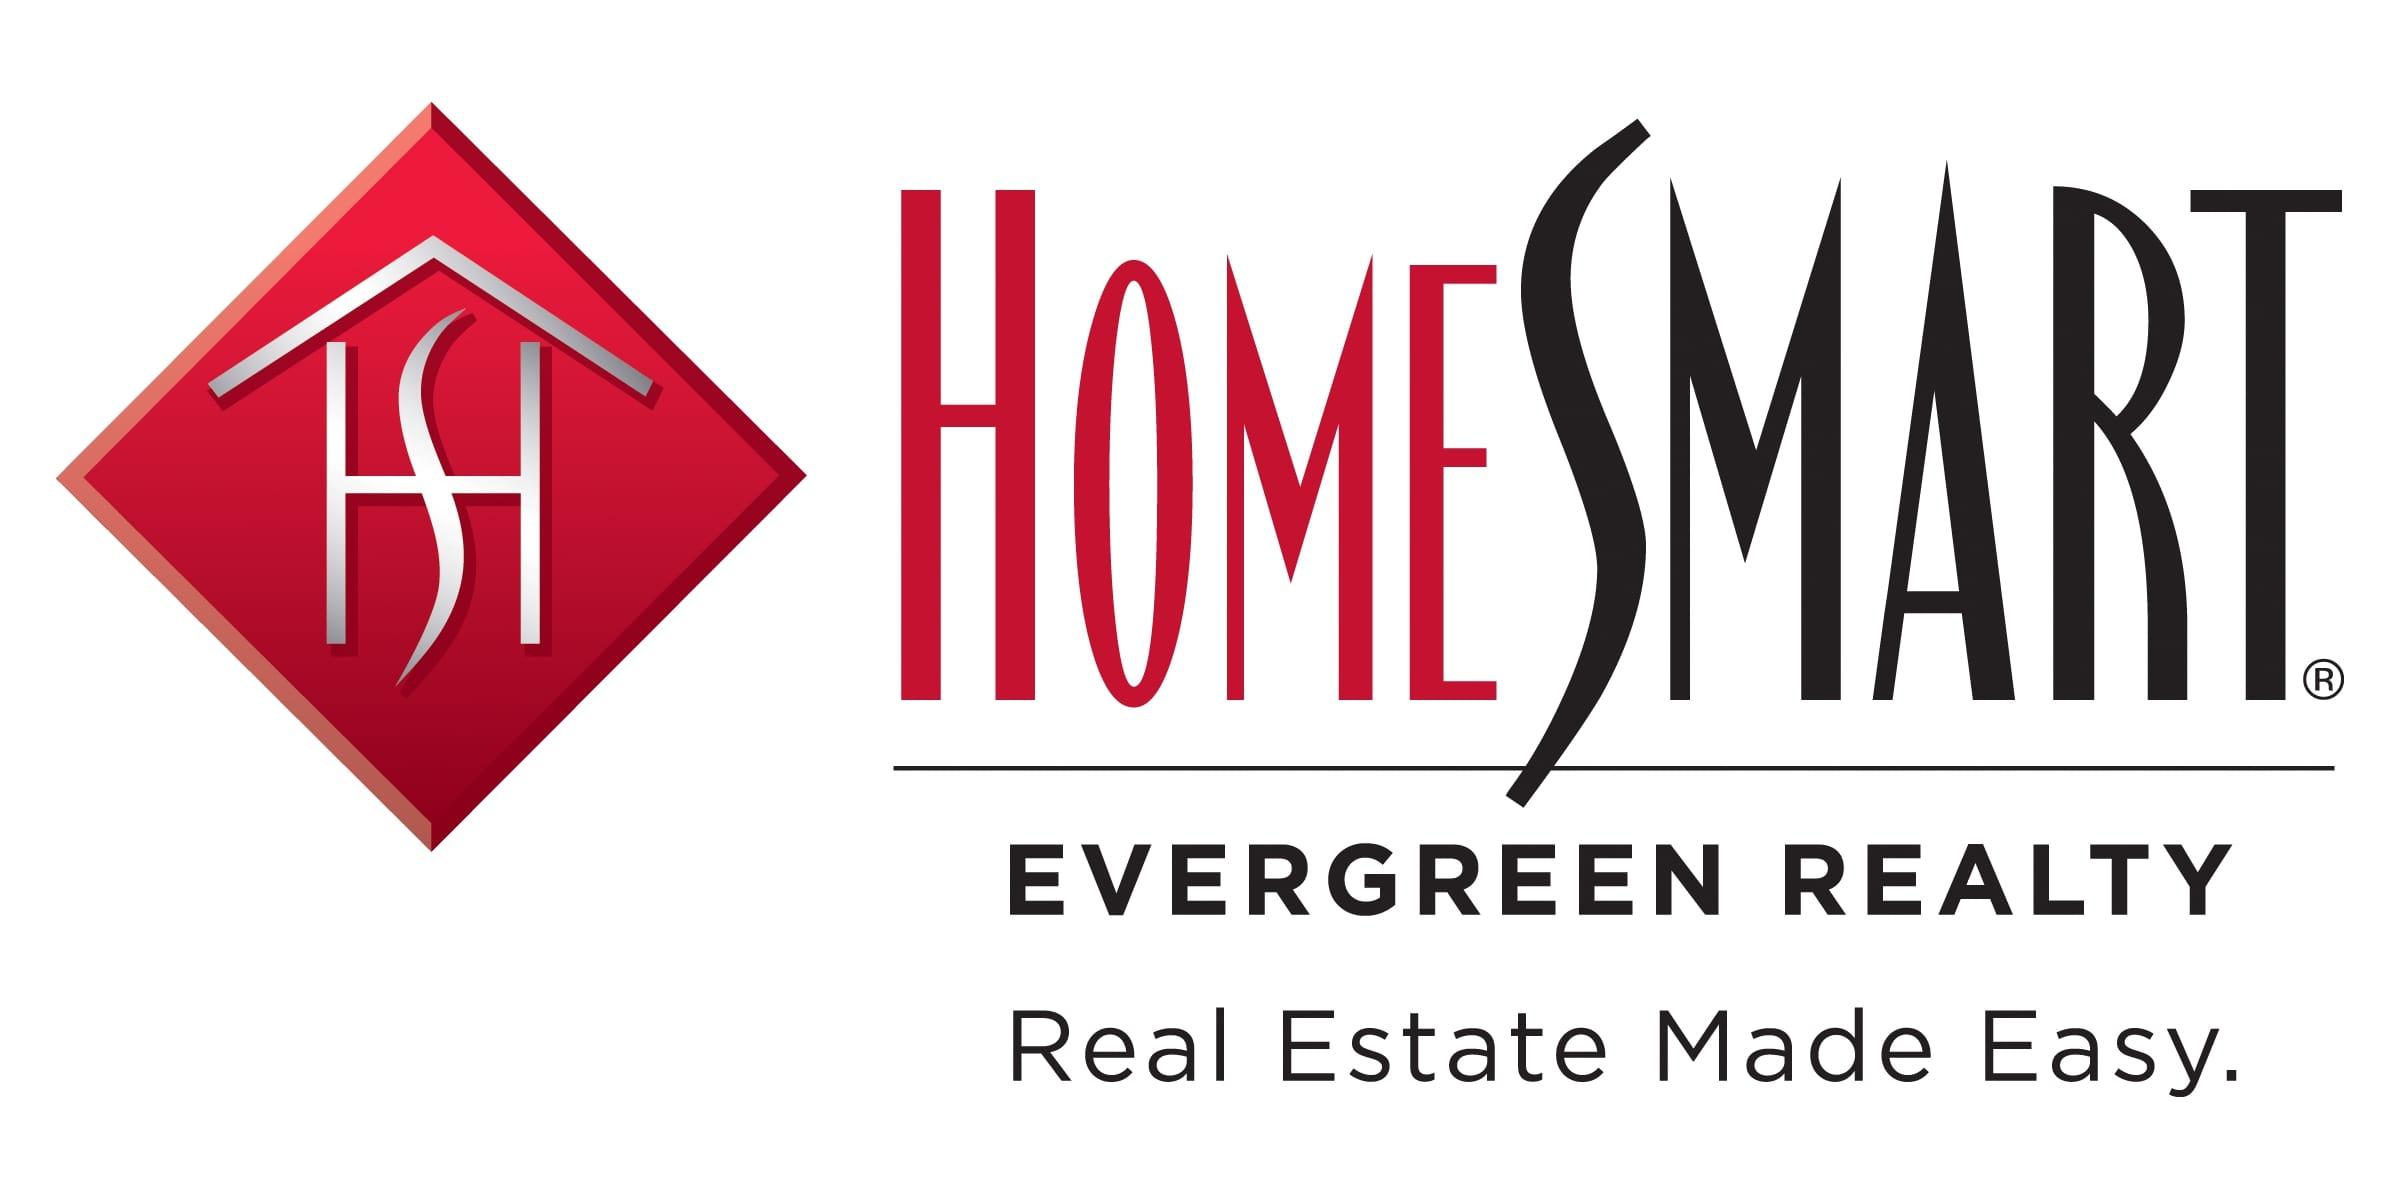 HomeSmart Evergreen Realty